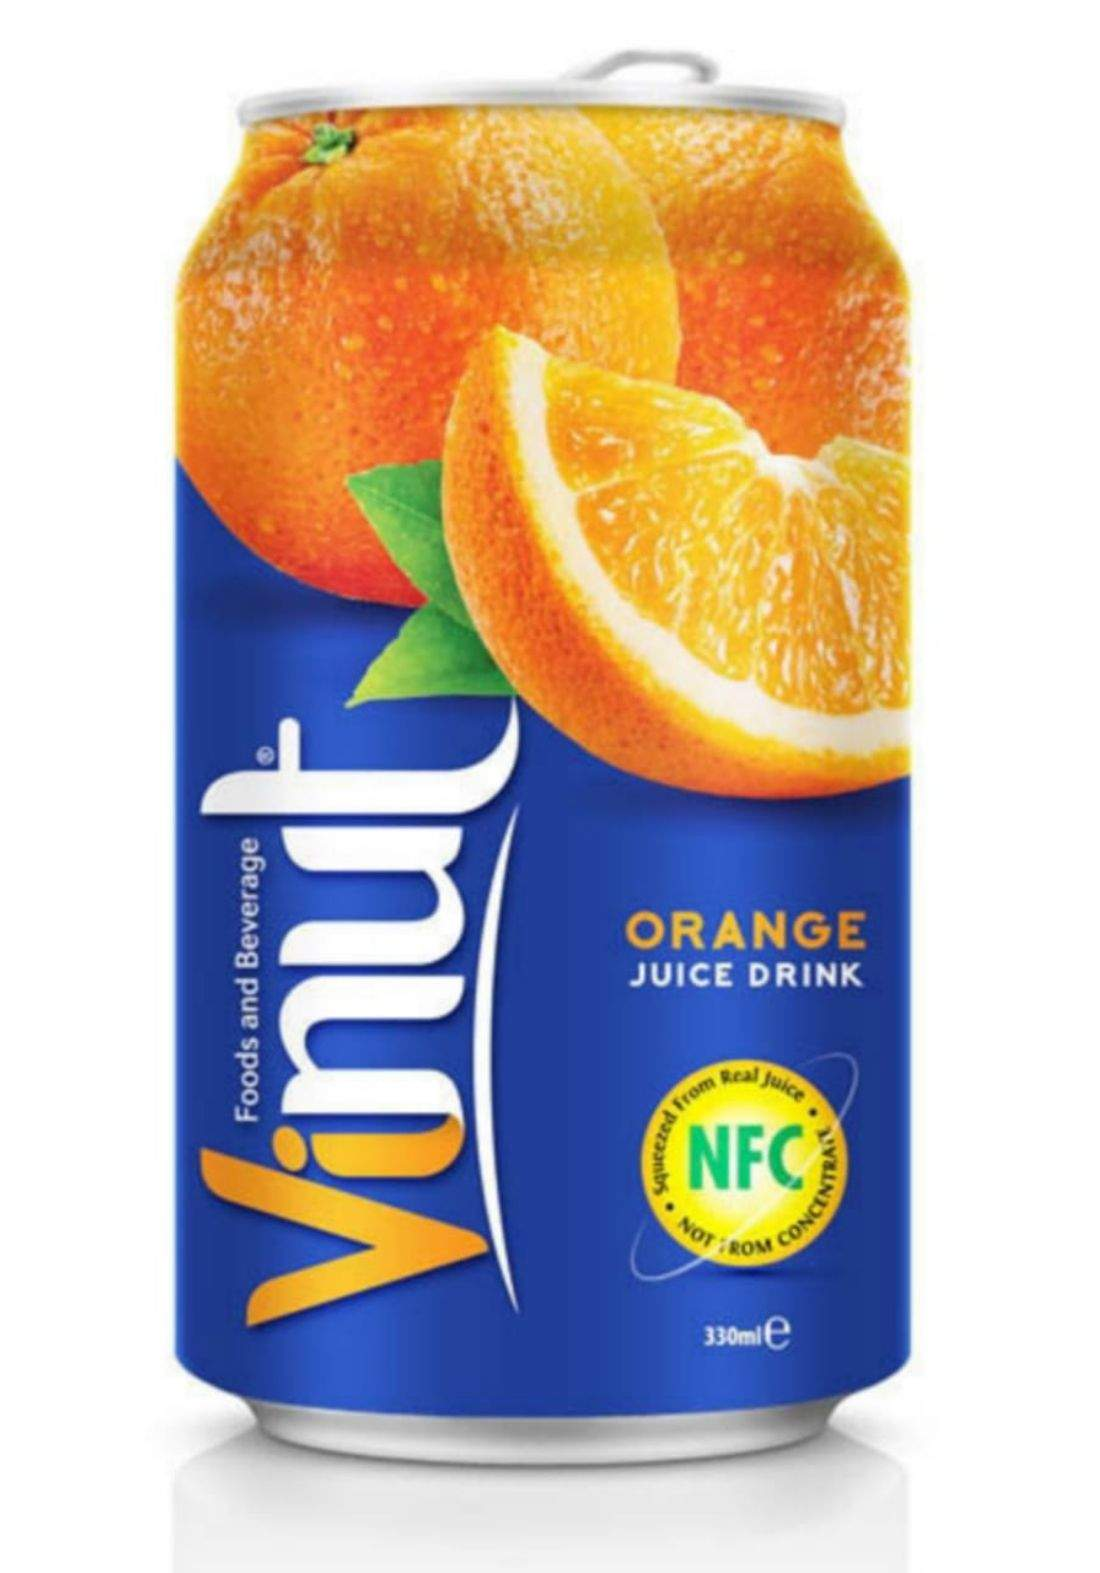 Vinut Orange Juice فينوت عصير برتقال 330 مل